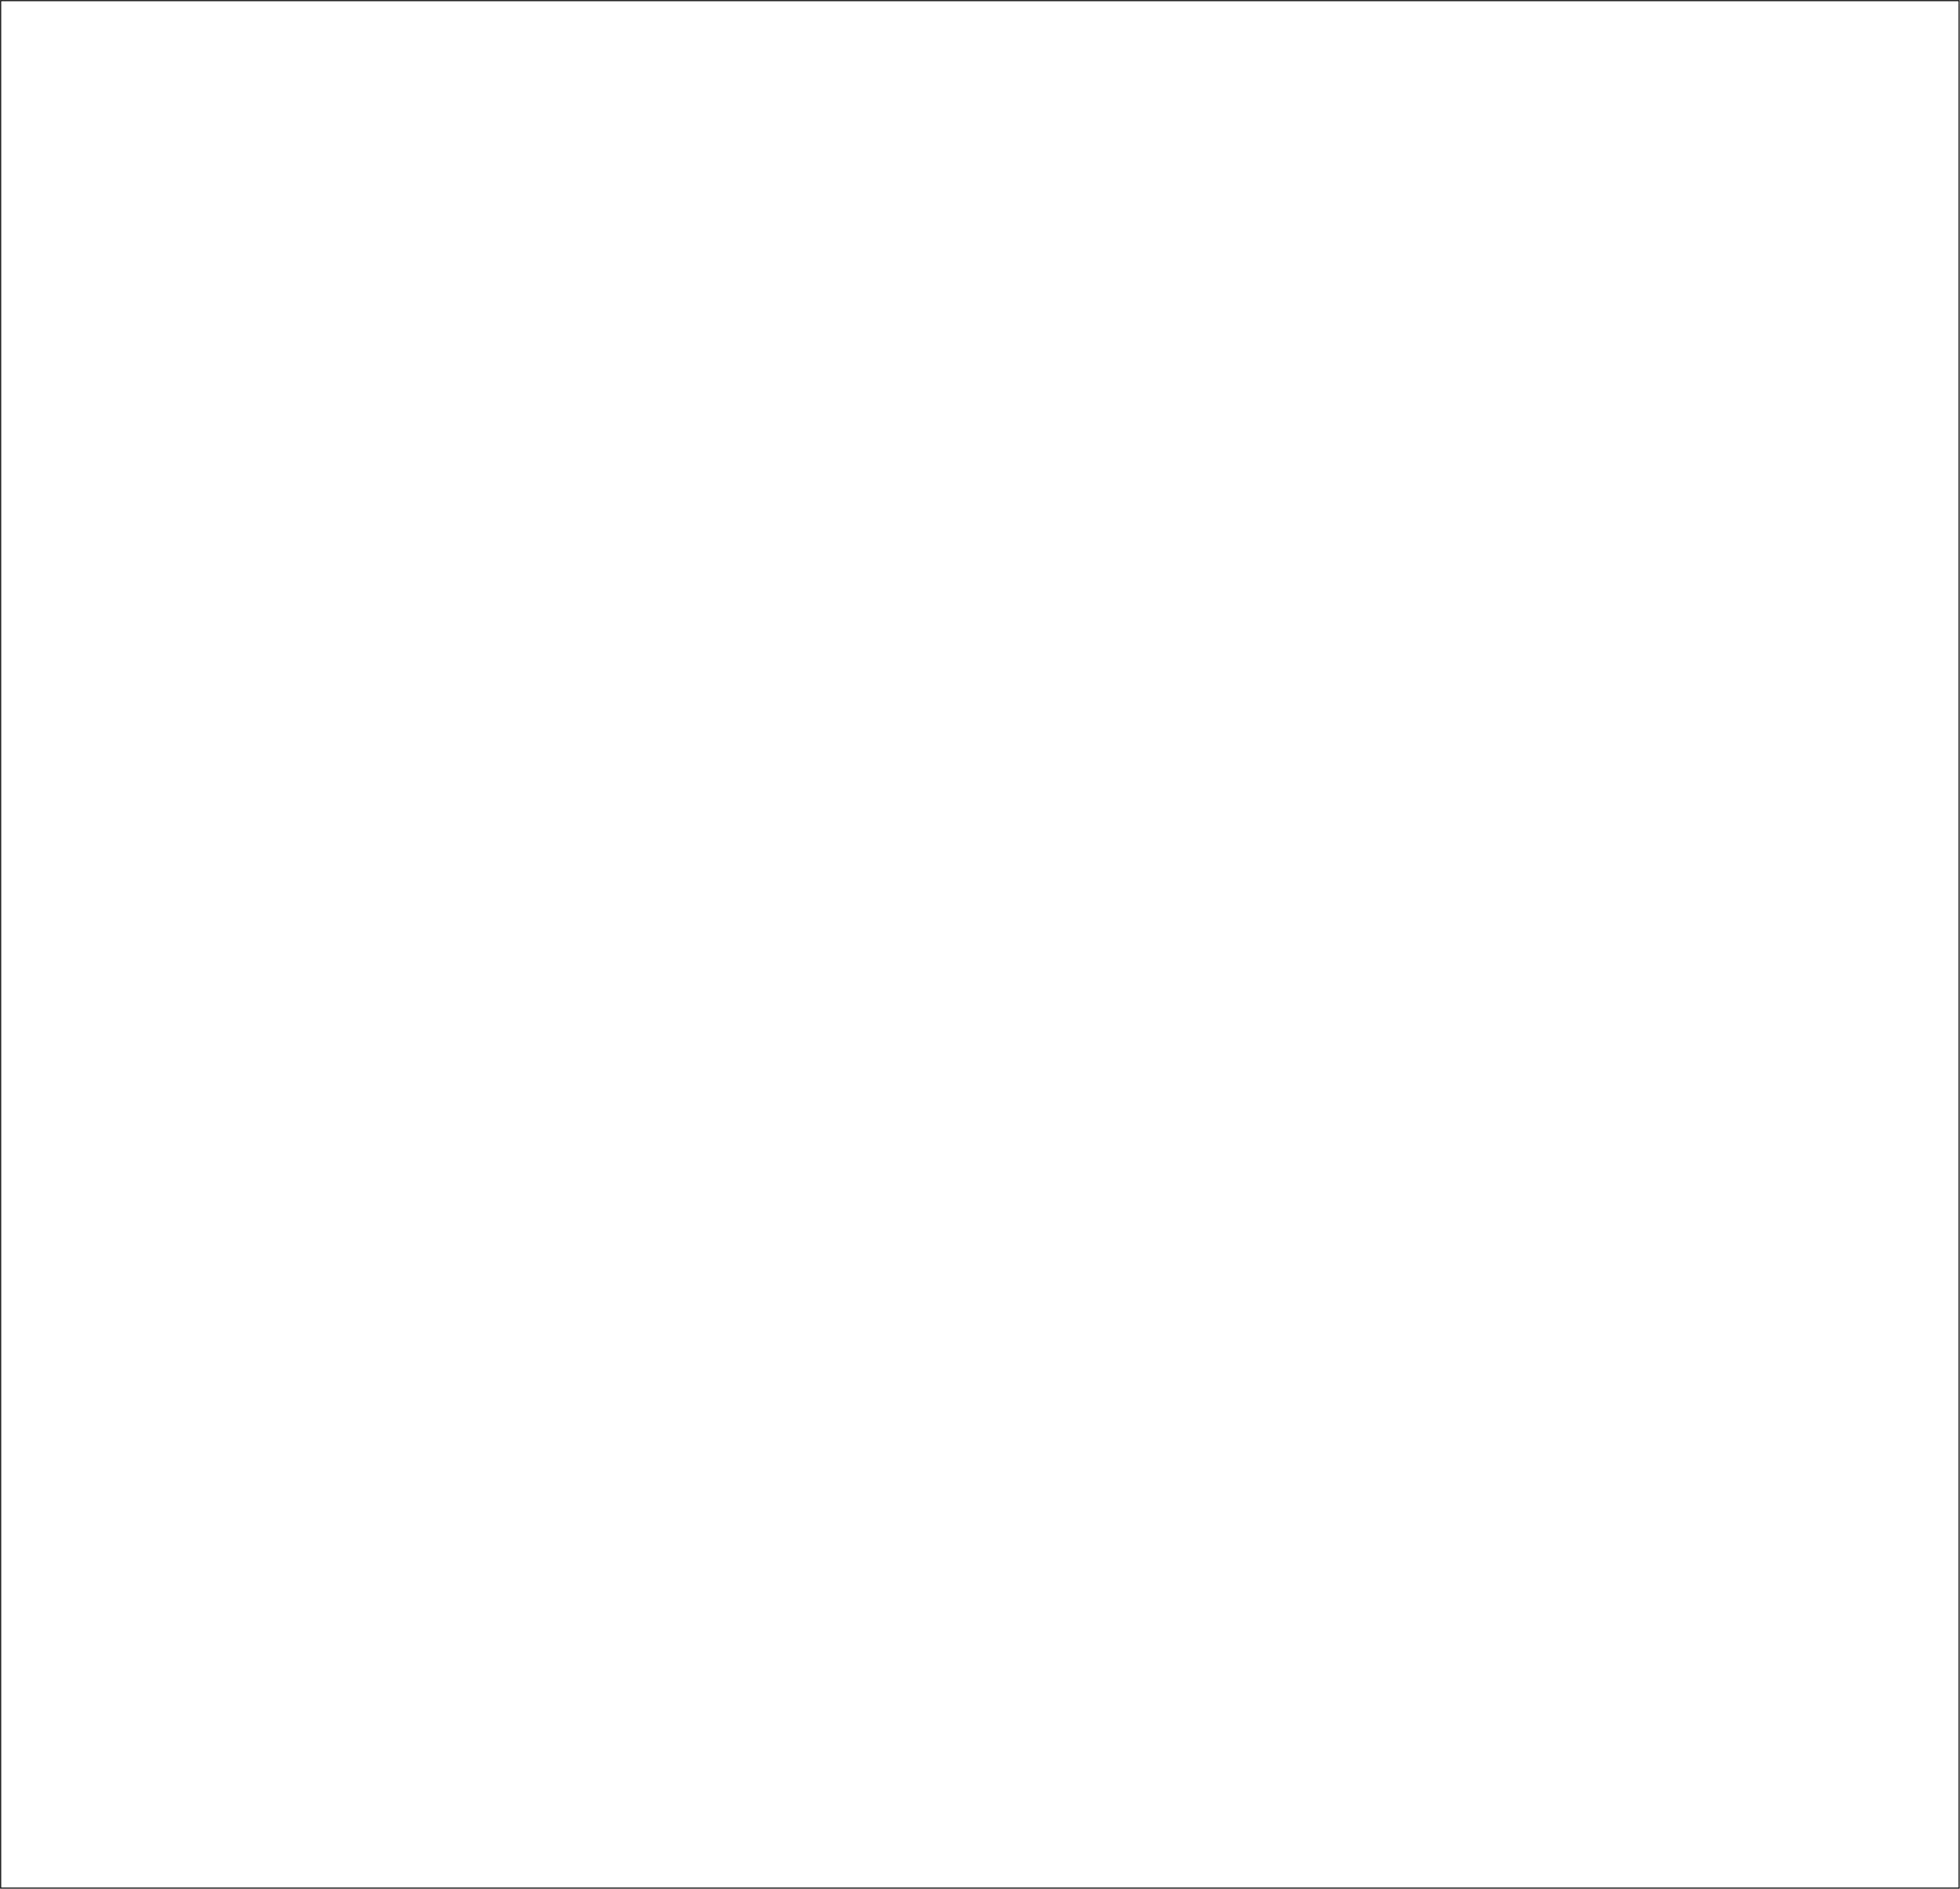 2010 - J. Roman Arguello, Yue Zhang, Tomoyuki Kado, Chuanzhu Fan, Ruoping Zhao, Hideki Innan, Wen Wang, and Manyuan Long. Recombination yet inefficient selection along the D. melanogaster subgroup's fourth chromosome. Molecular Biology & Evolution, 27: 848-861.